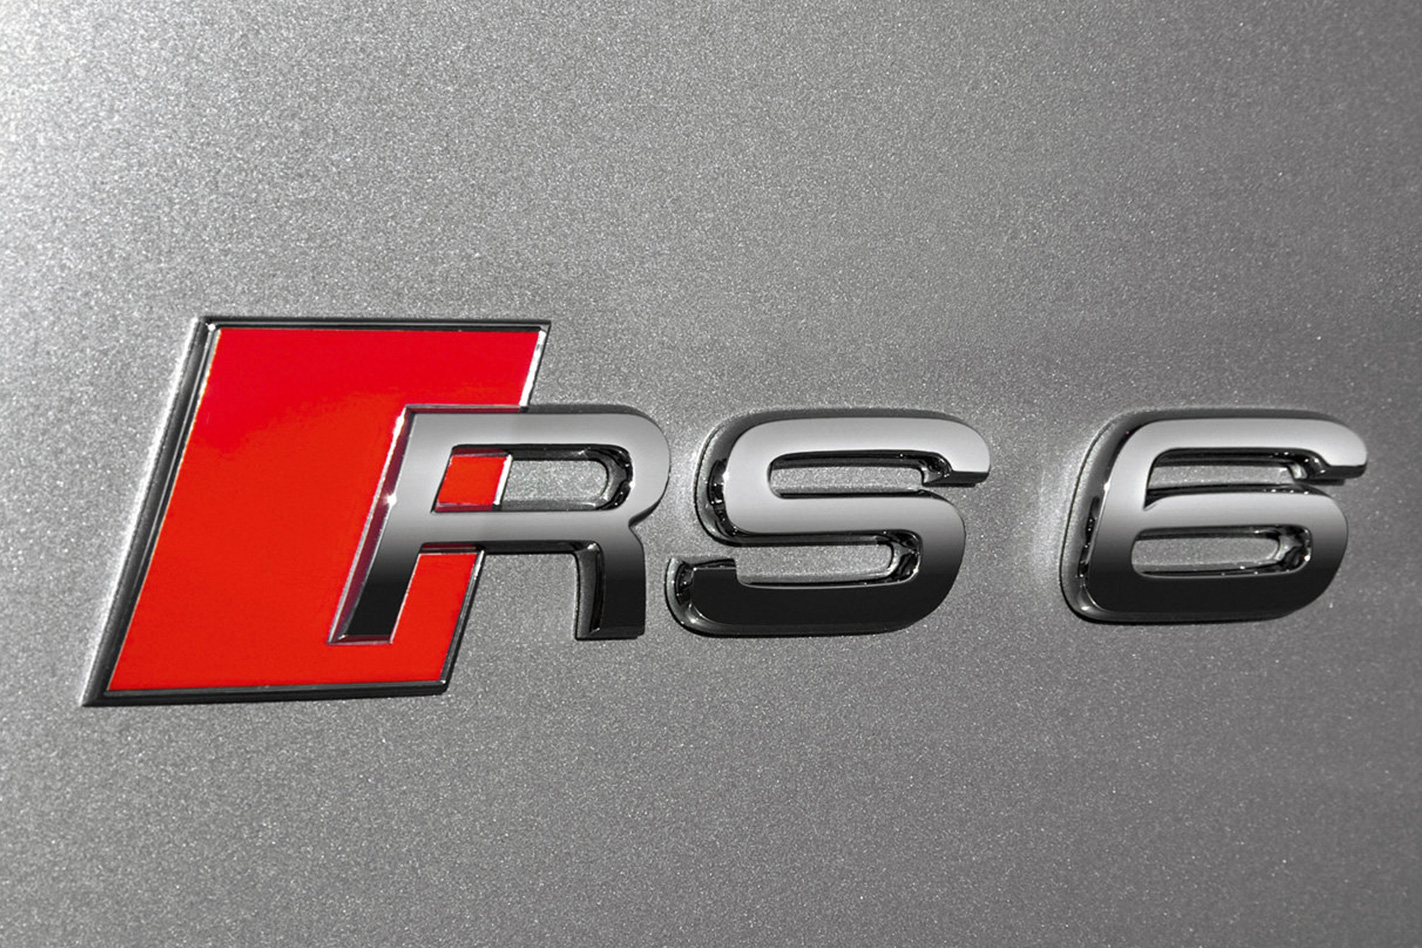 2008 Audi RS6 Avant badge